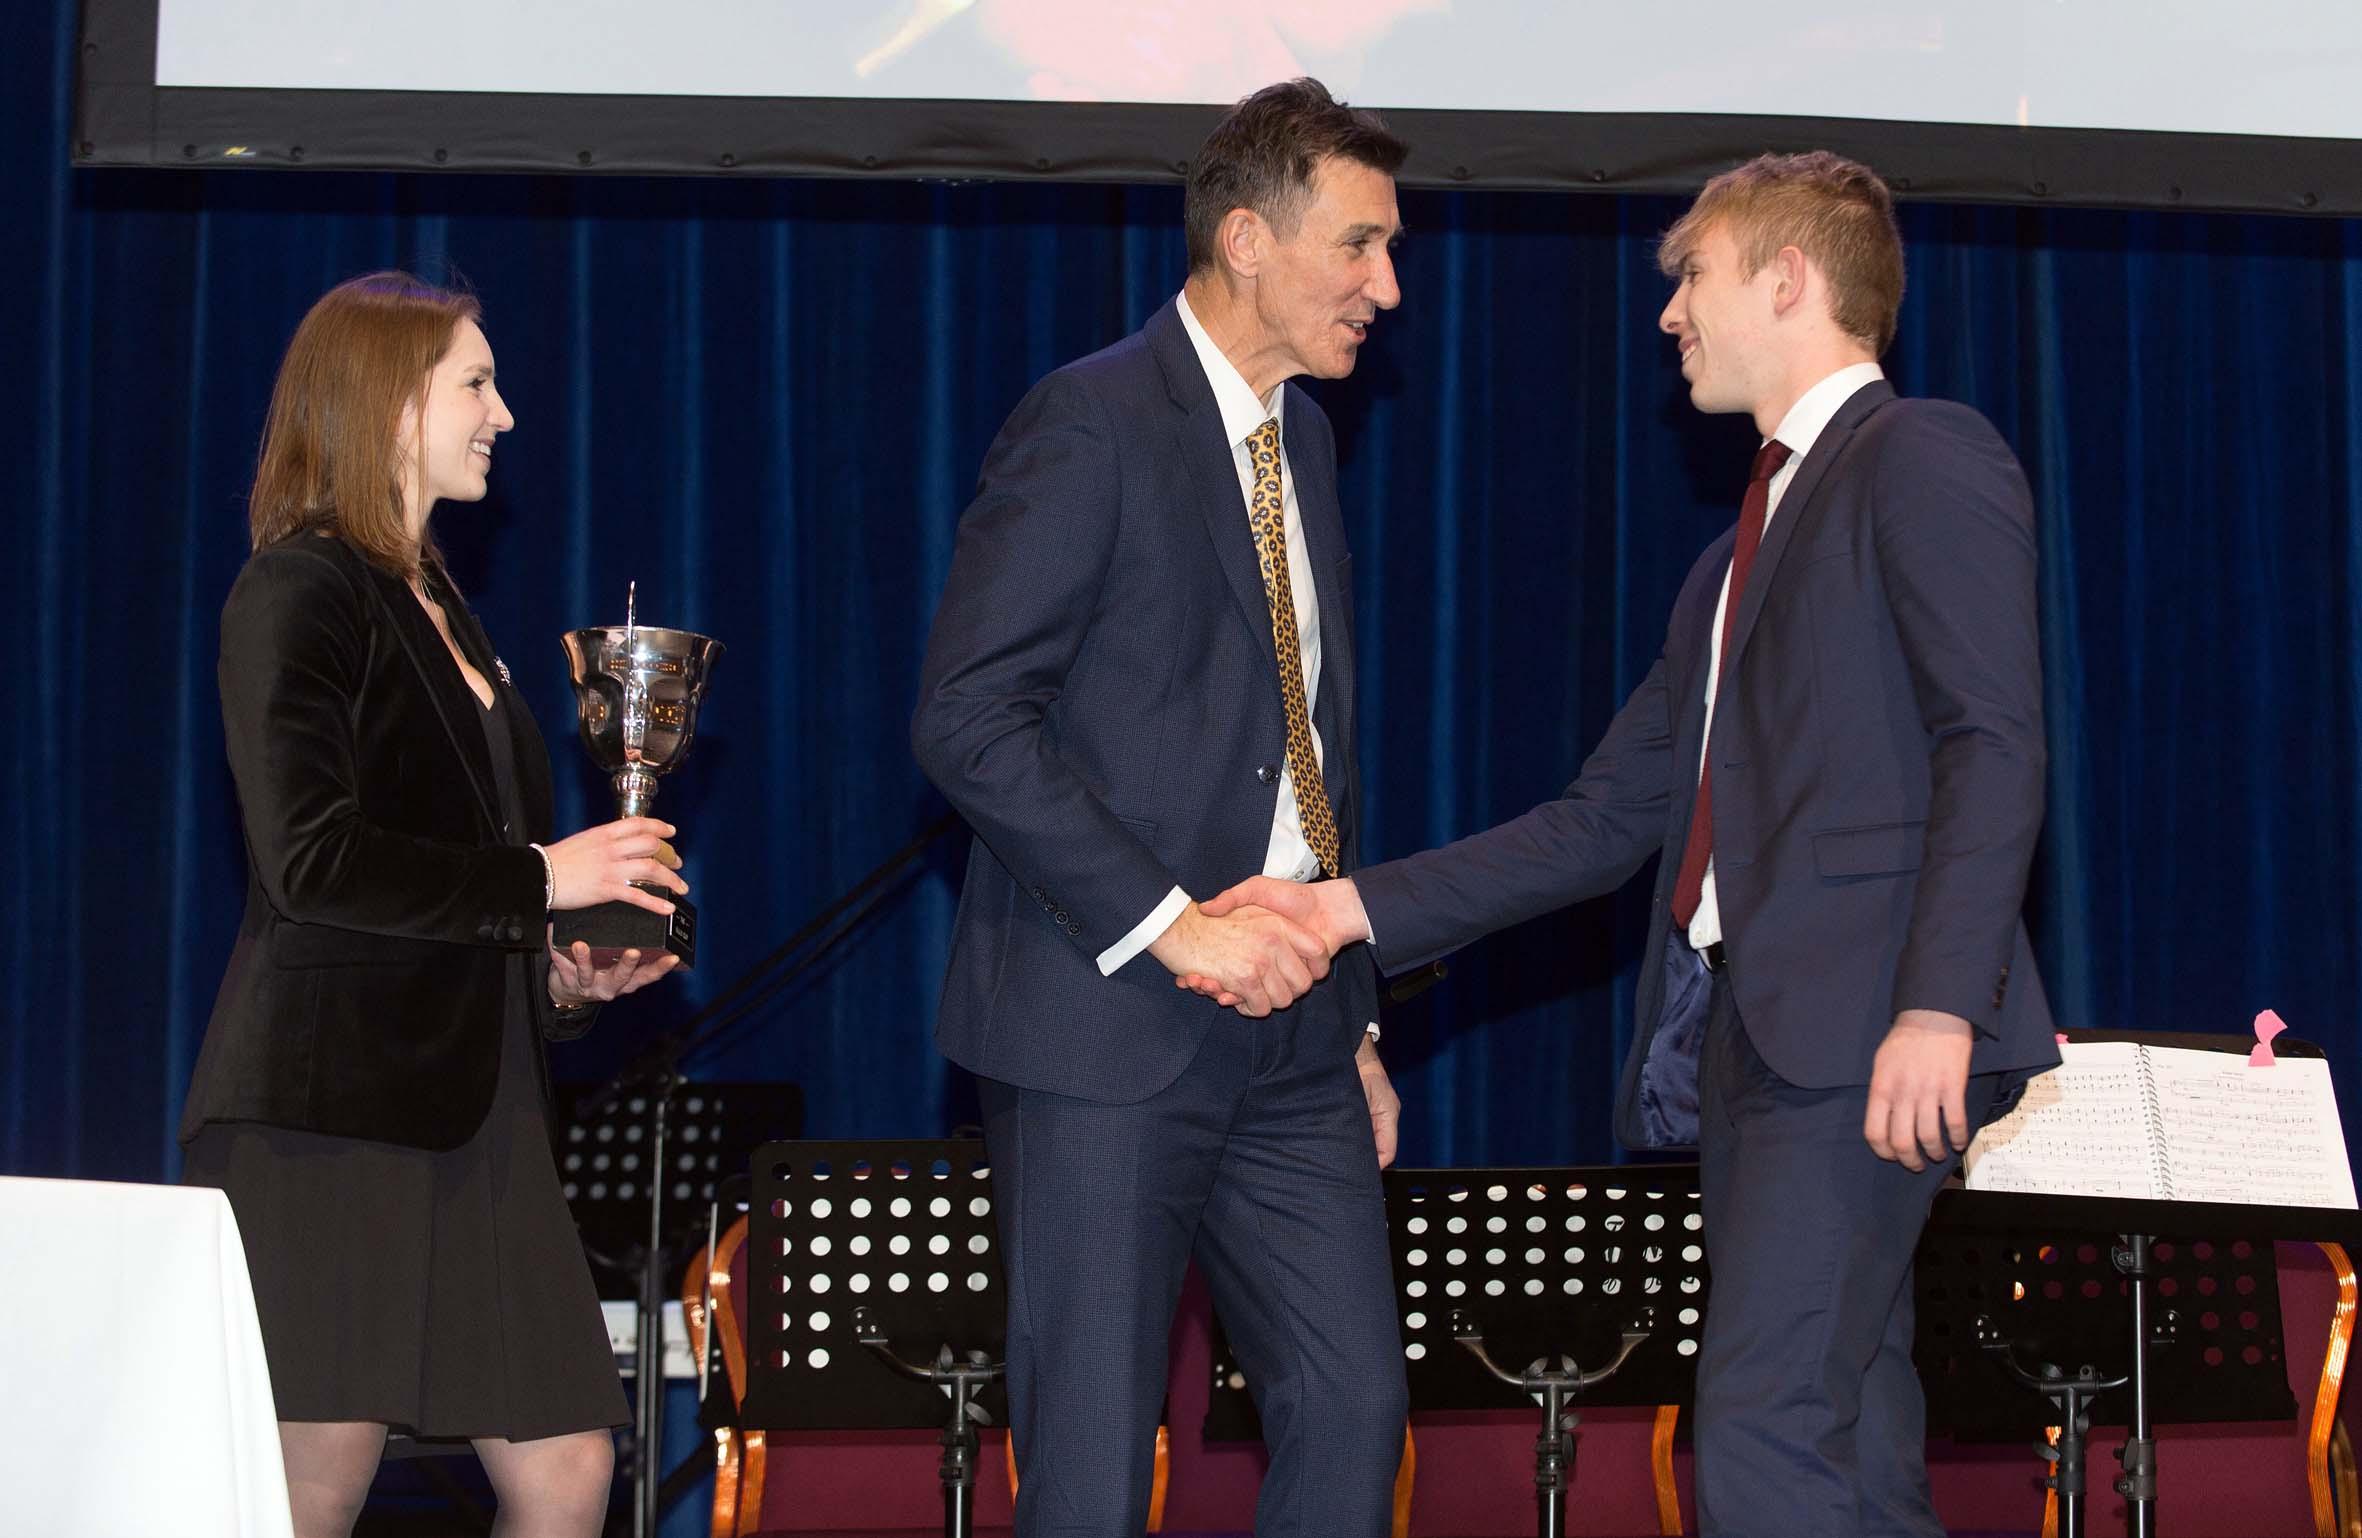 4. Ellie Rymer and Richard Sheriff, CEO of RKLT, presenting awards Harrogate Grammar